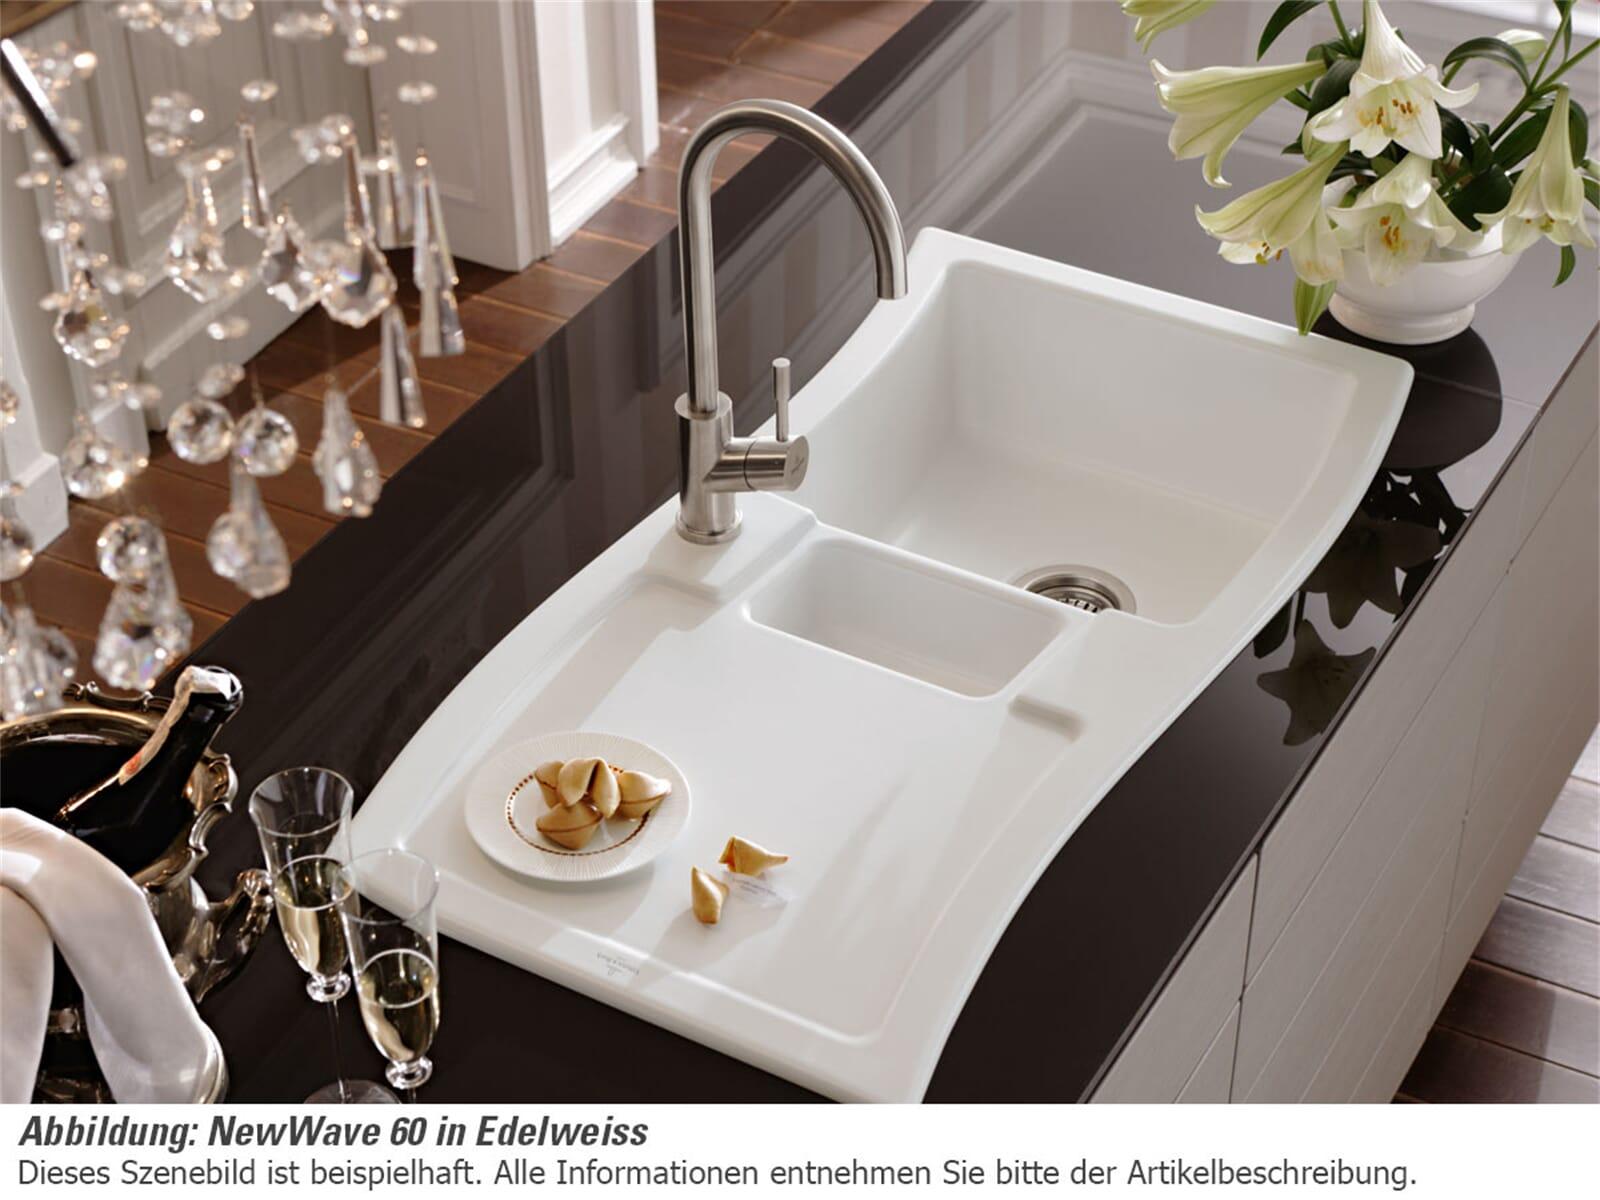 villeroy boch newwave 60 cappuccino 6716 01 i2 keramiksp le handbet tigung. Black Bedroom Furniture Sets. Home Design Ideas